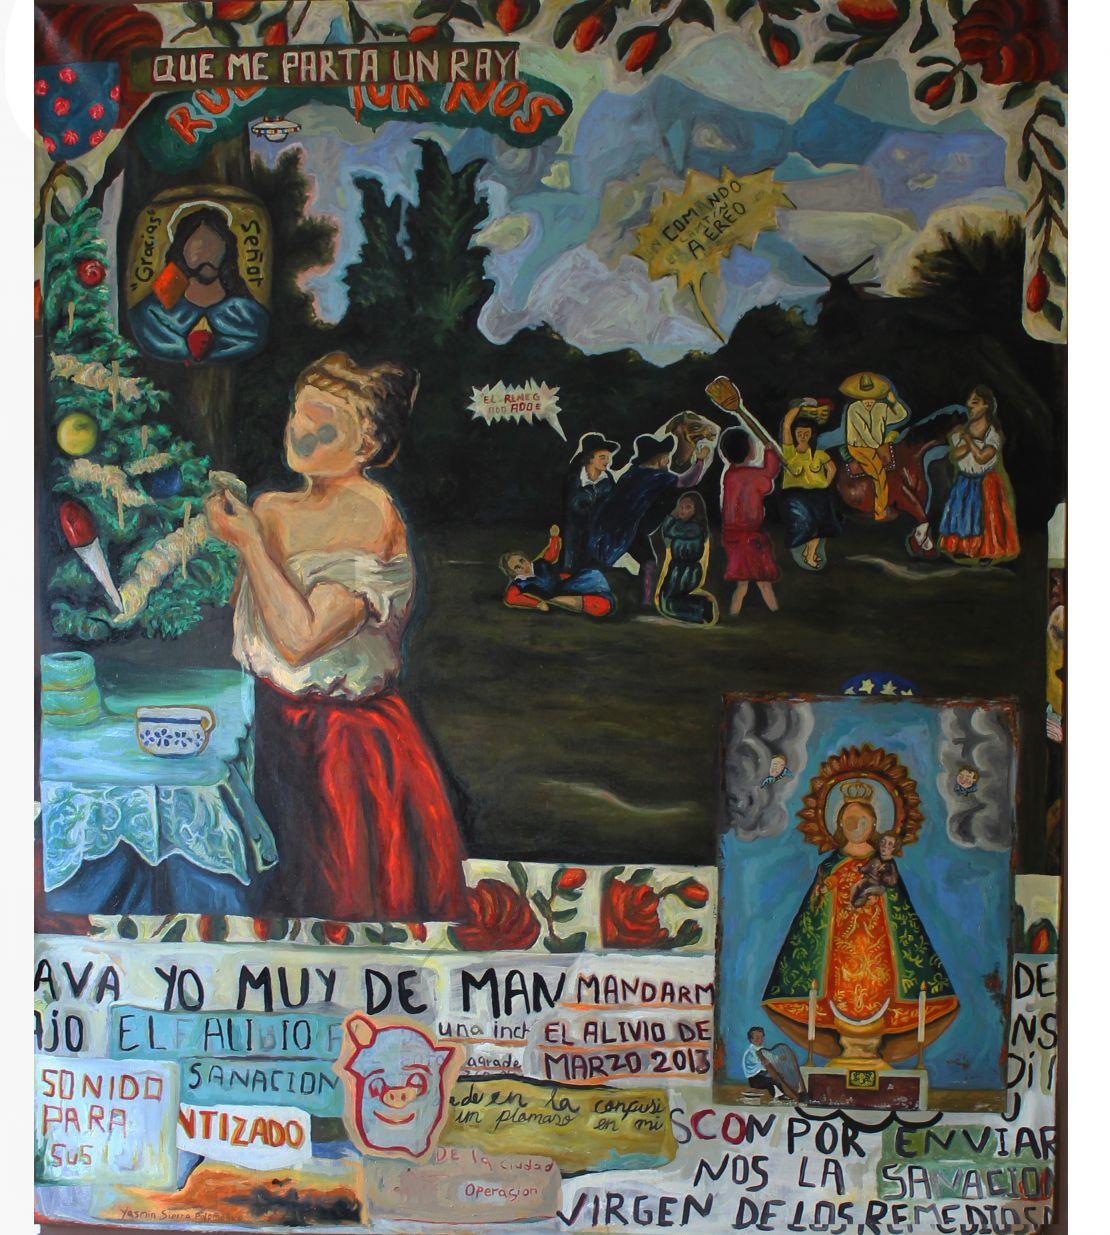 Olvidarte nunca (2016) - Yasmin Sierra Palomeque